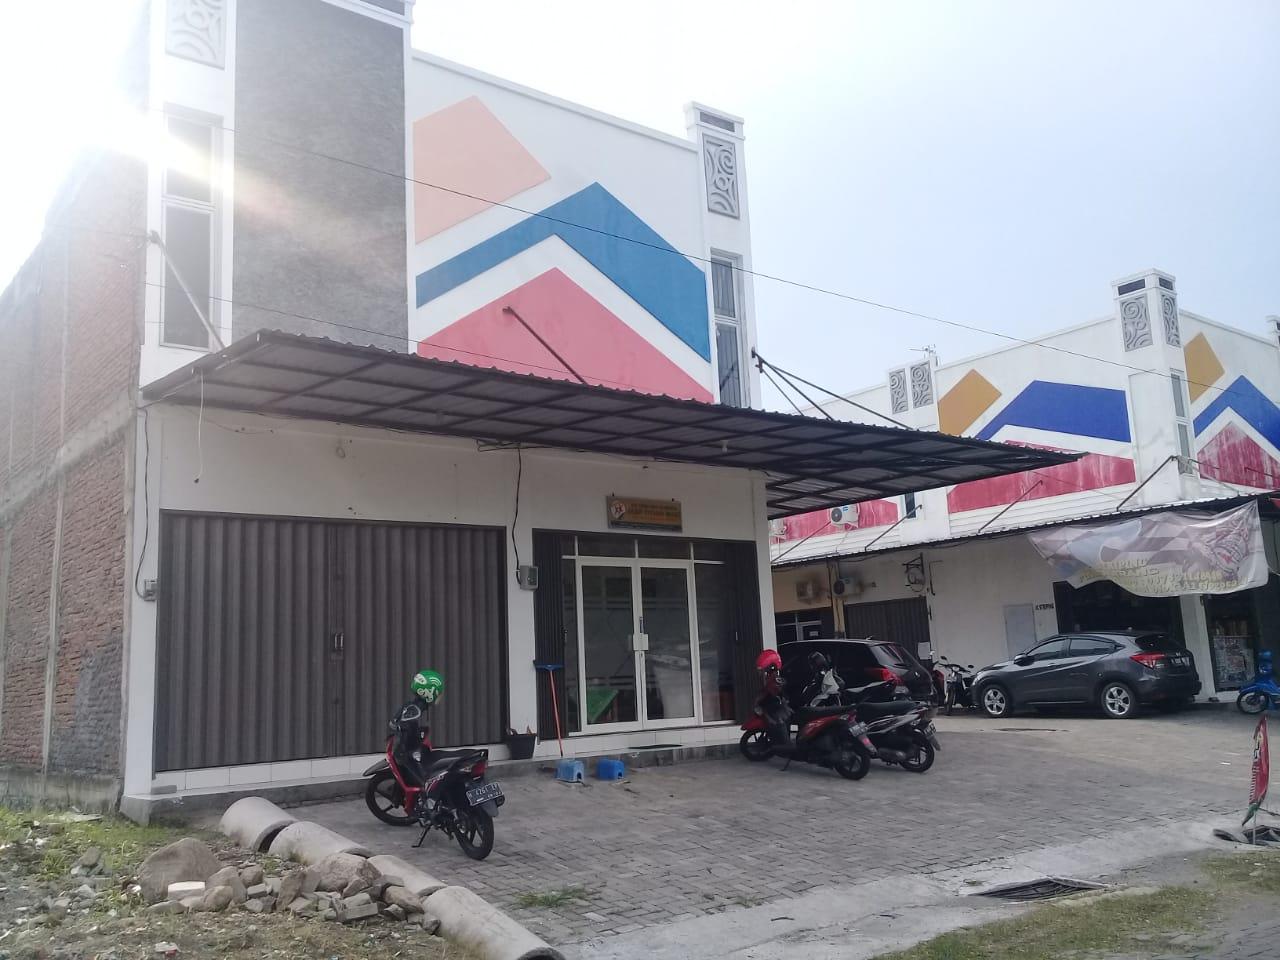 Dijual Murah Ruko Tlogosari: di jual Ruko di Jln Satrio Wibowo Tlogosari no 2, KOTA SEMARANG, JAWA TENGAH